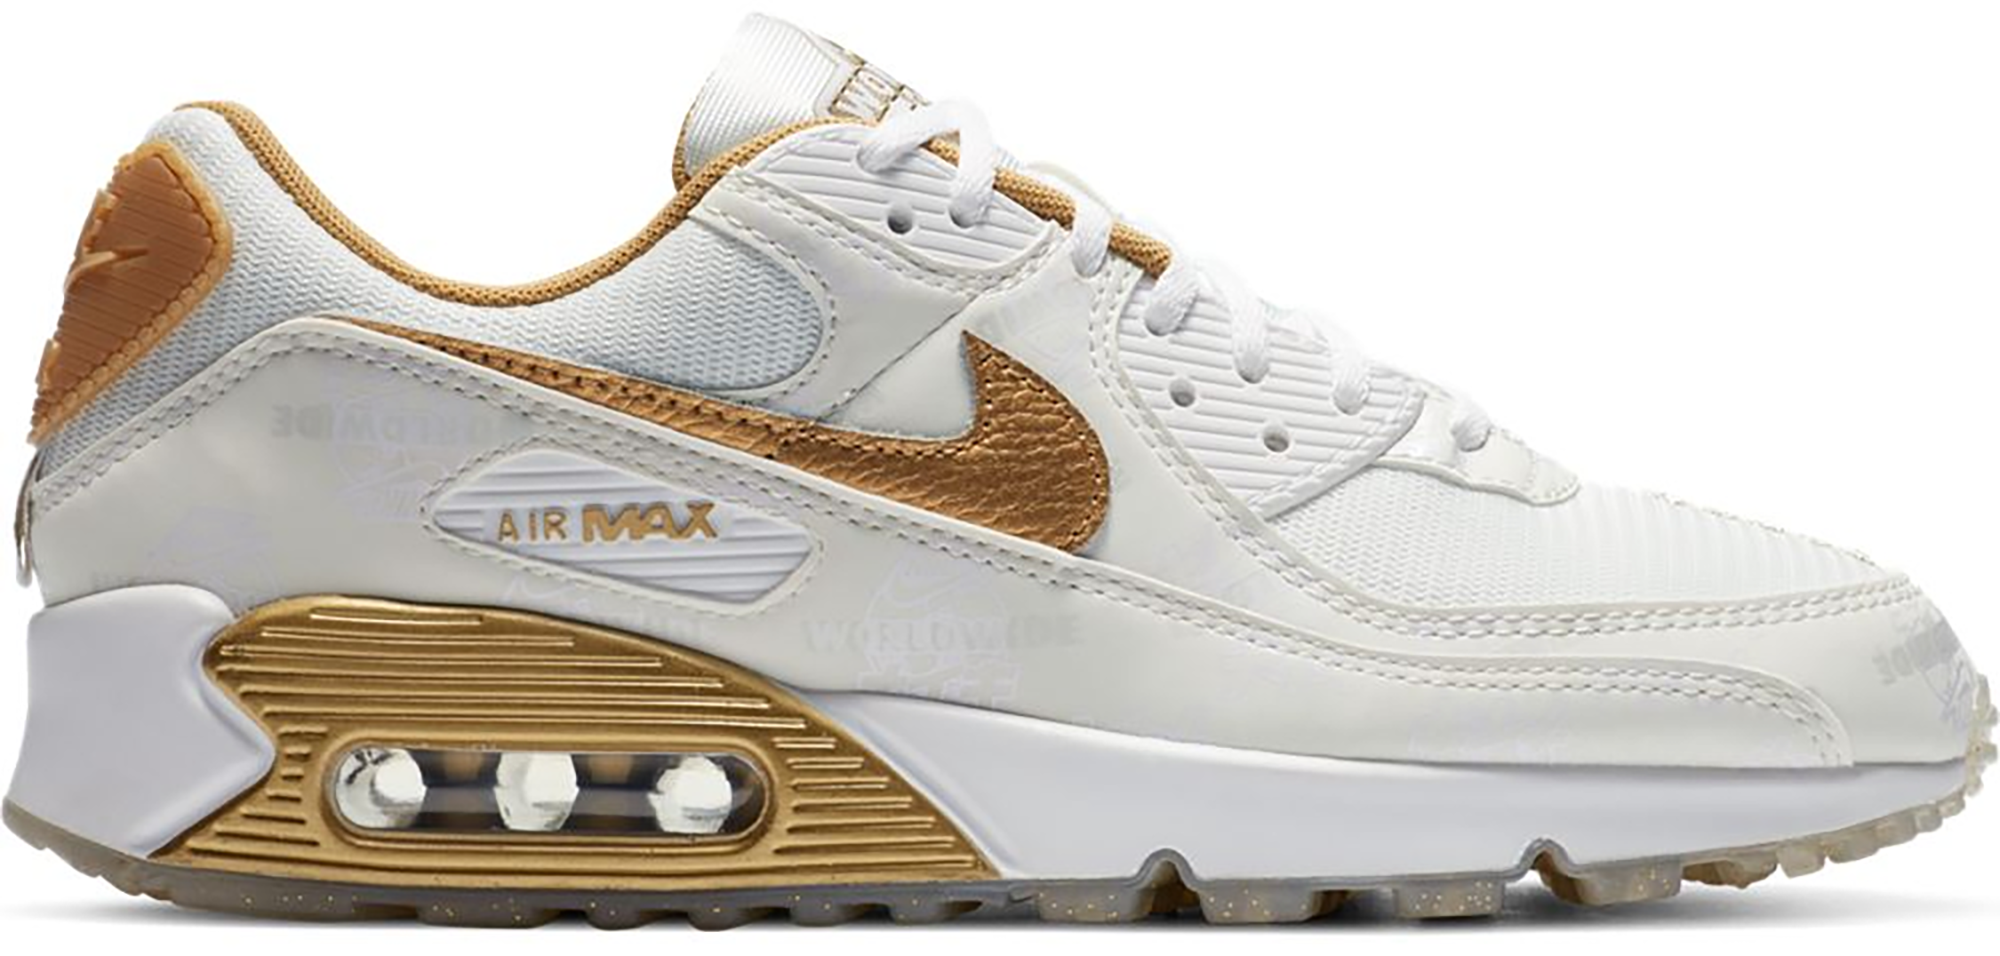 Nike Air Max 90 Worldwide White Gold (W